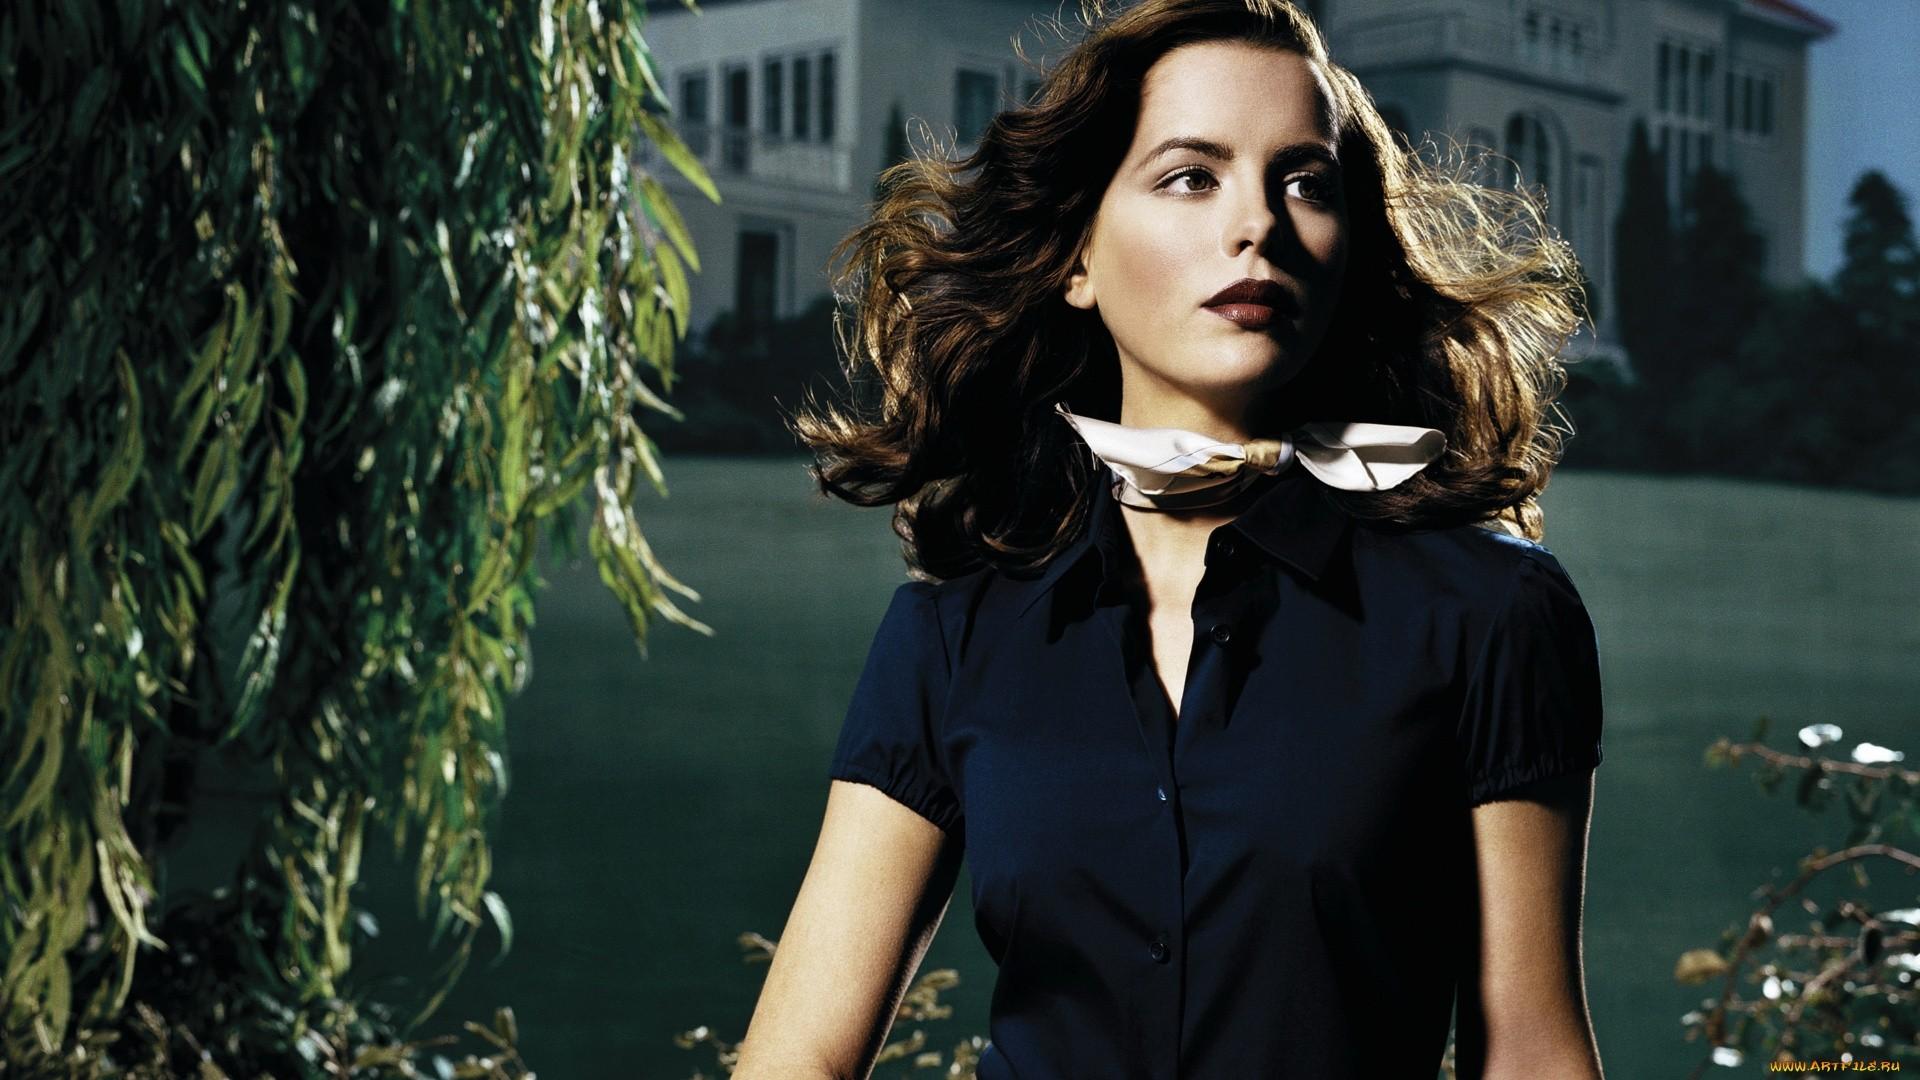 Kate Beckinsale Wallpaper Free Download